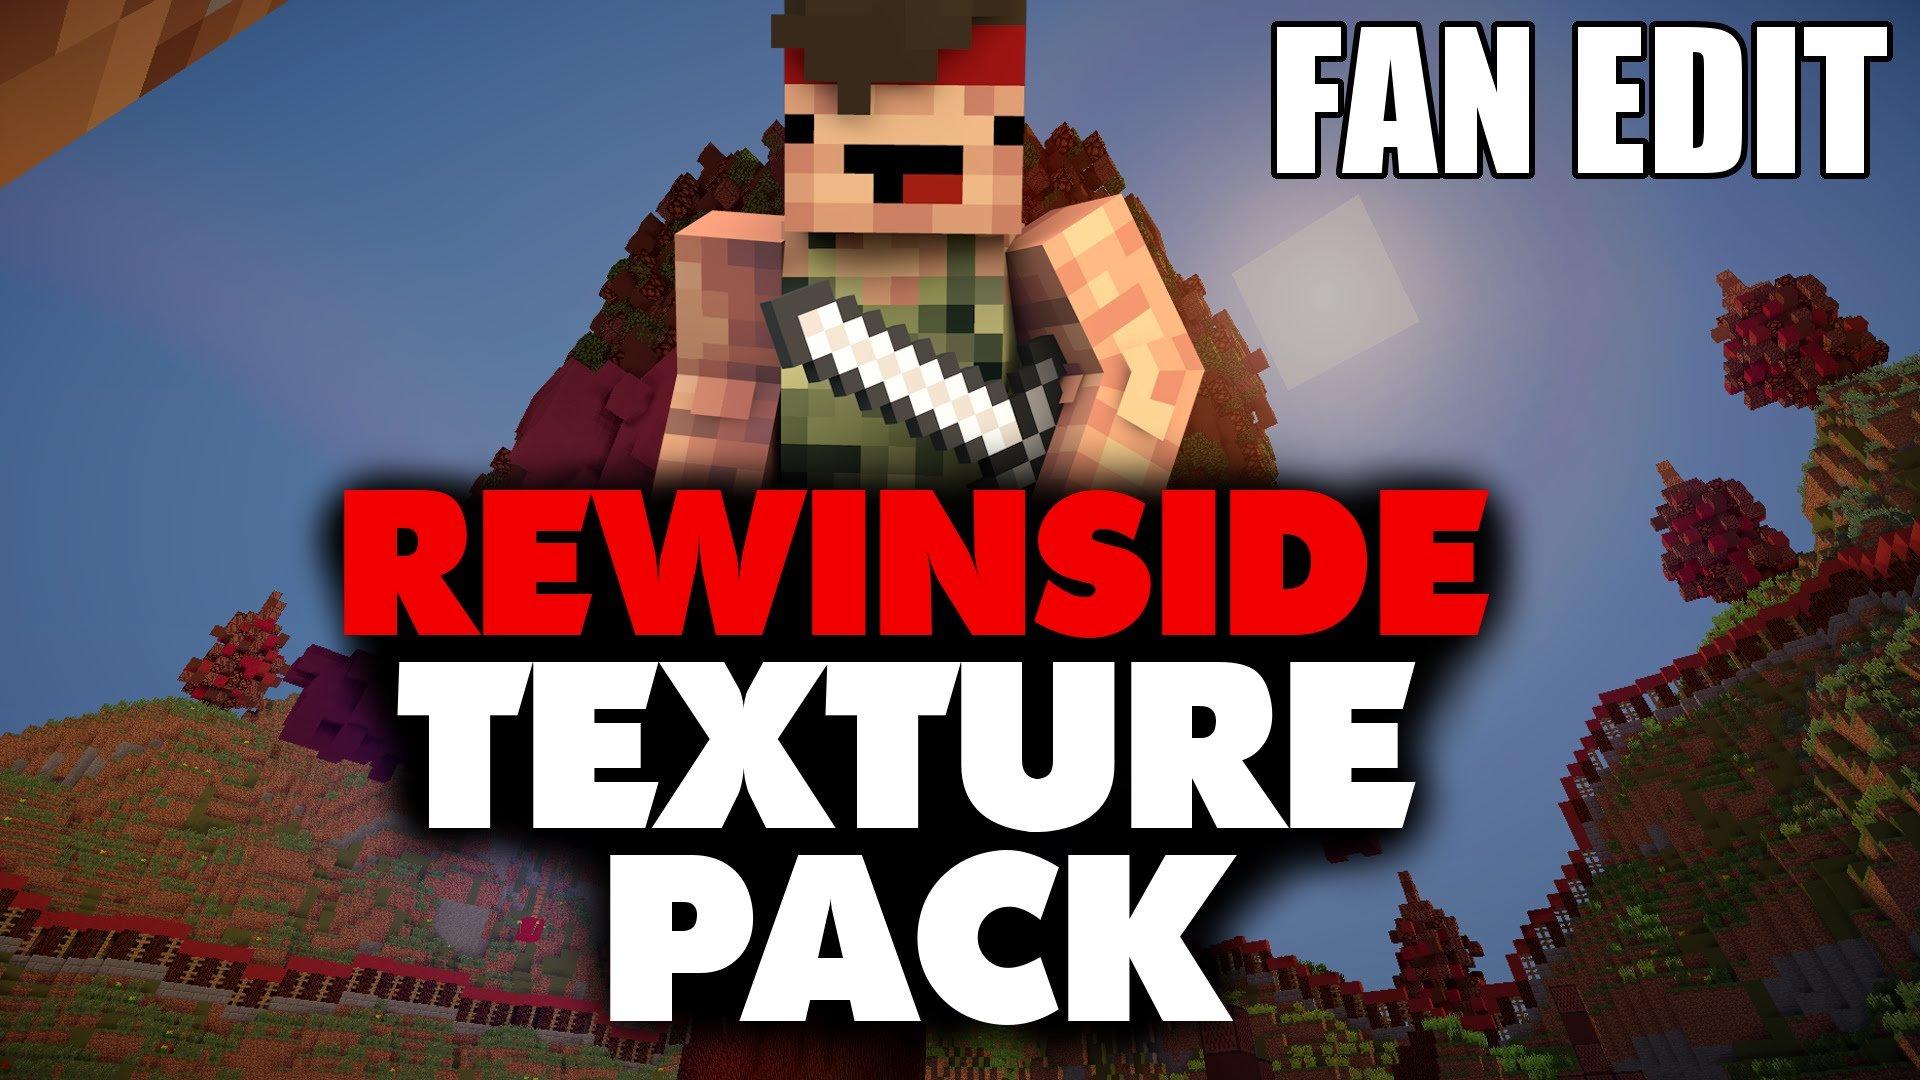 ᐅ Rewinside Texture Pack Texture Pack Für Minecraft - Minecraft texture pack namen andern